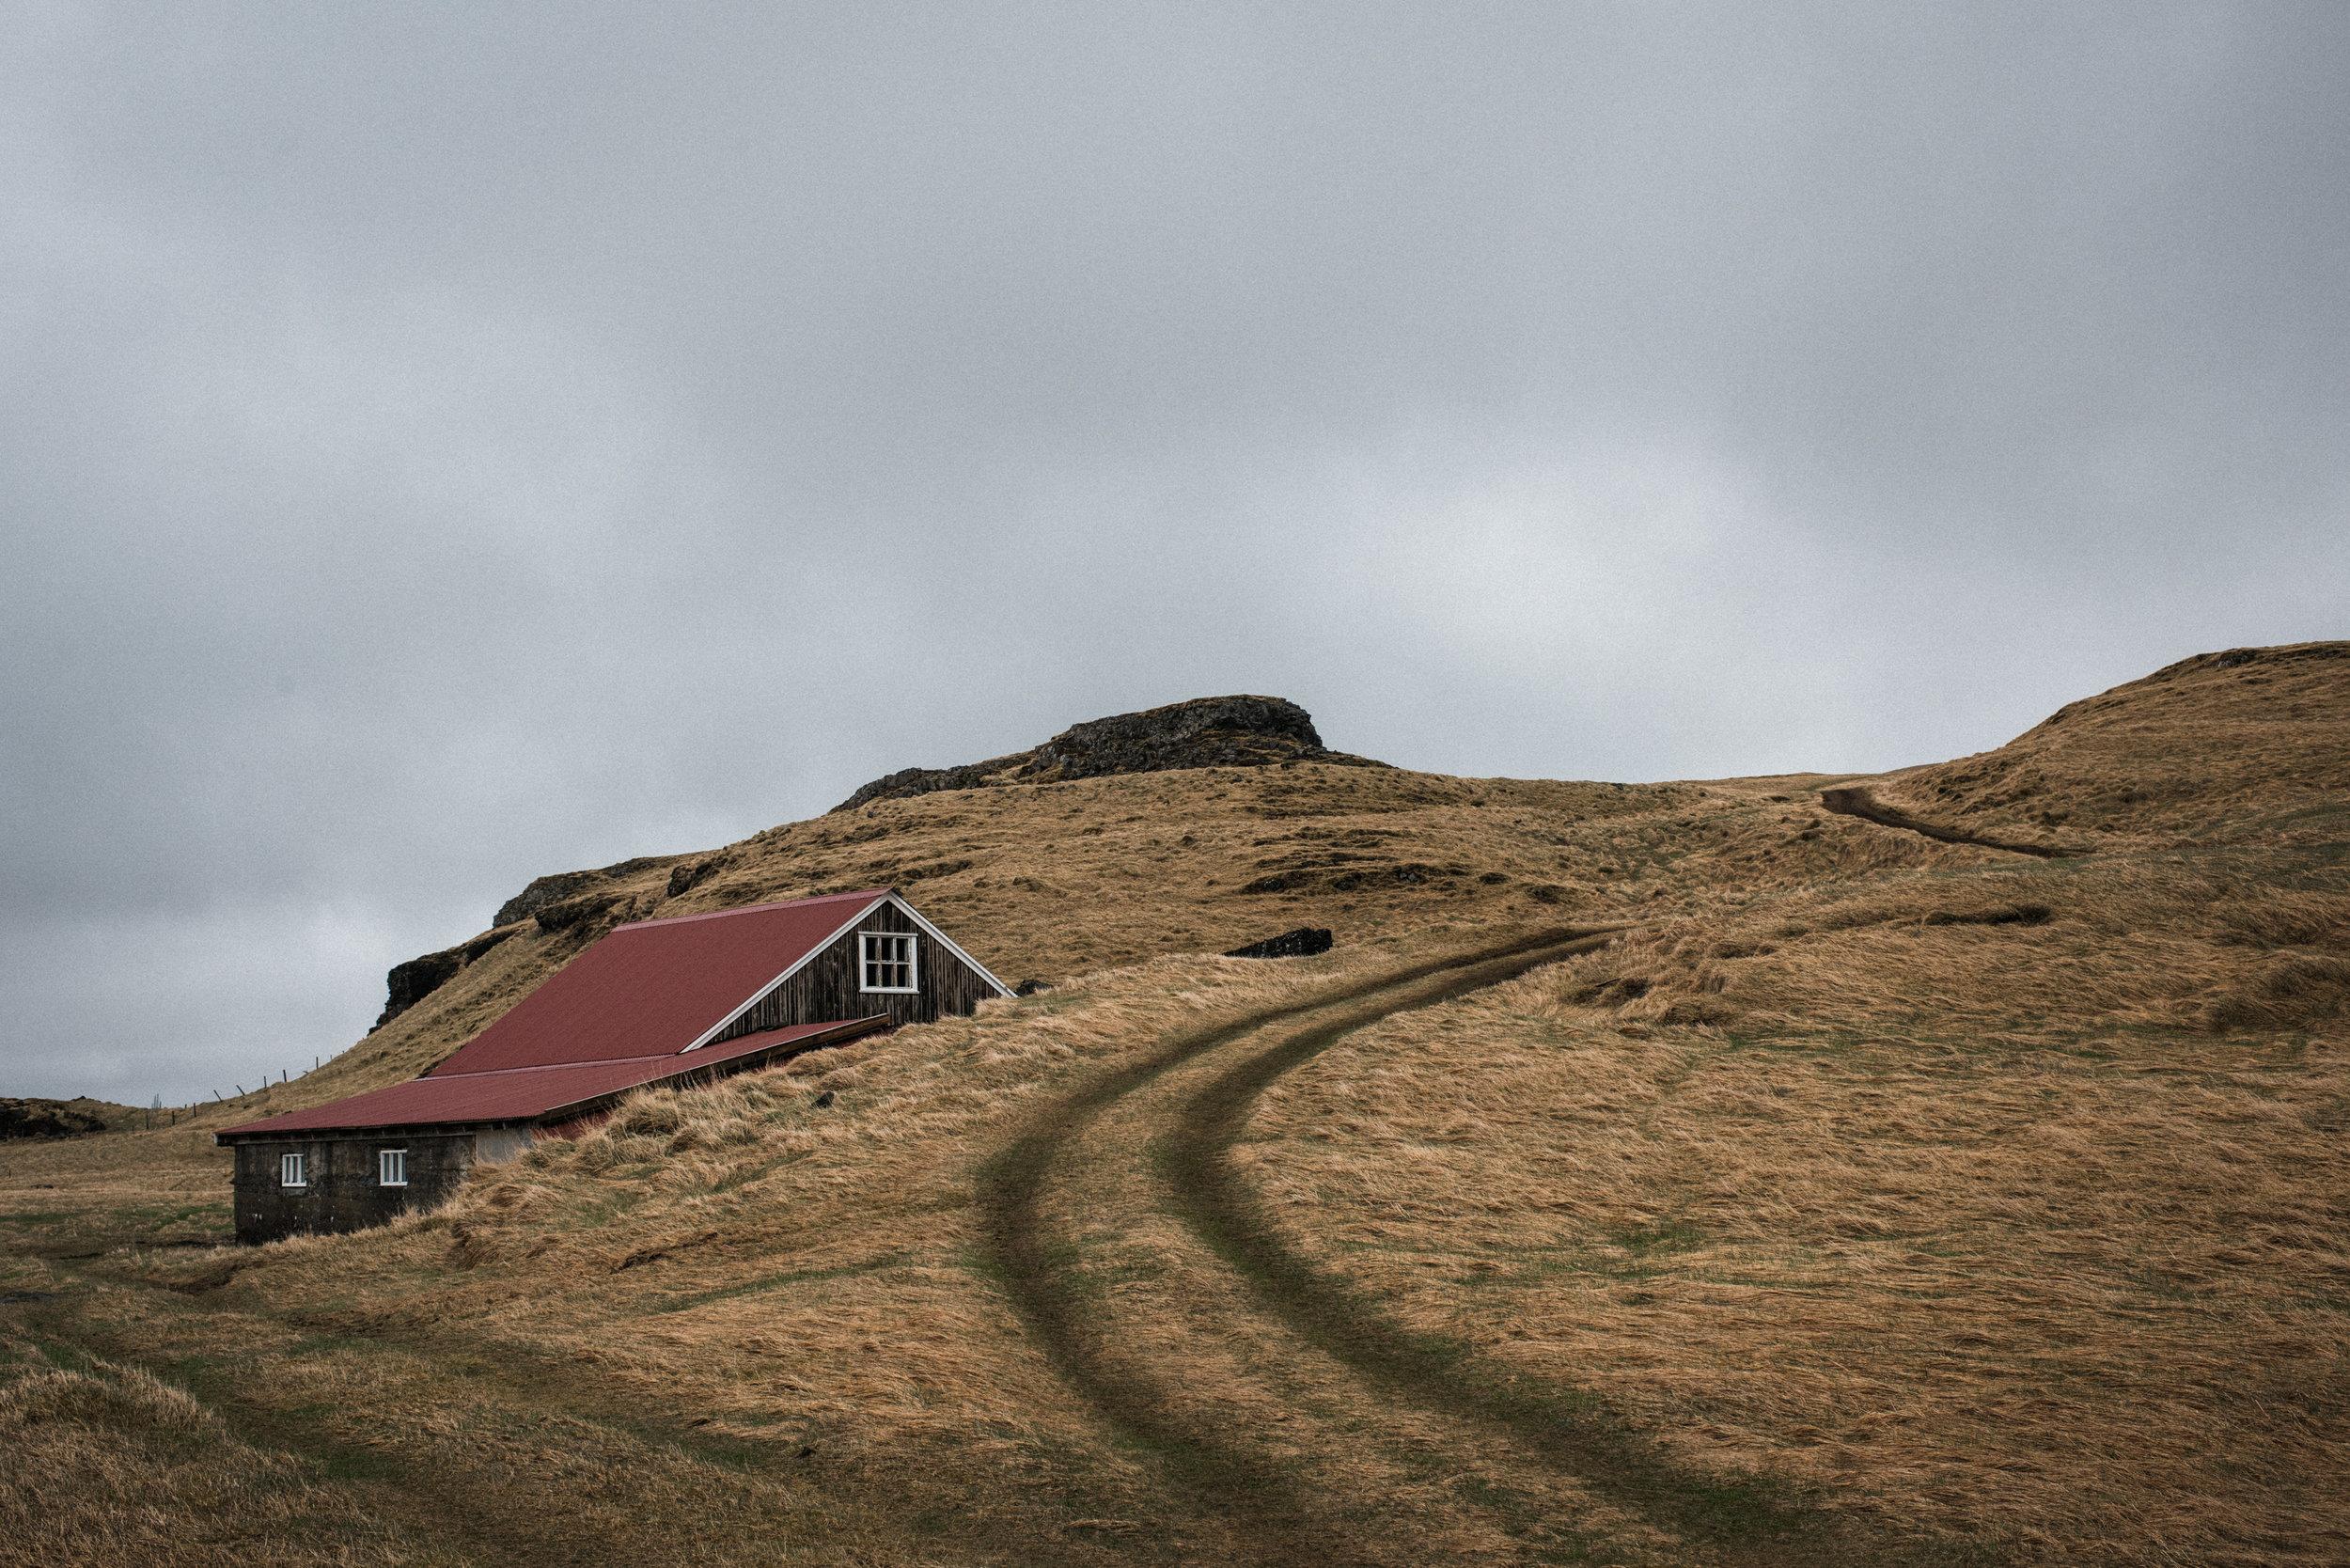 ICELAND_WOMAN_PHOTOGRAPHER_TARASHUPE_OUTDOOR_PHOTOGRAPHY_008.jpg